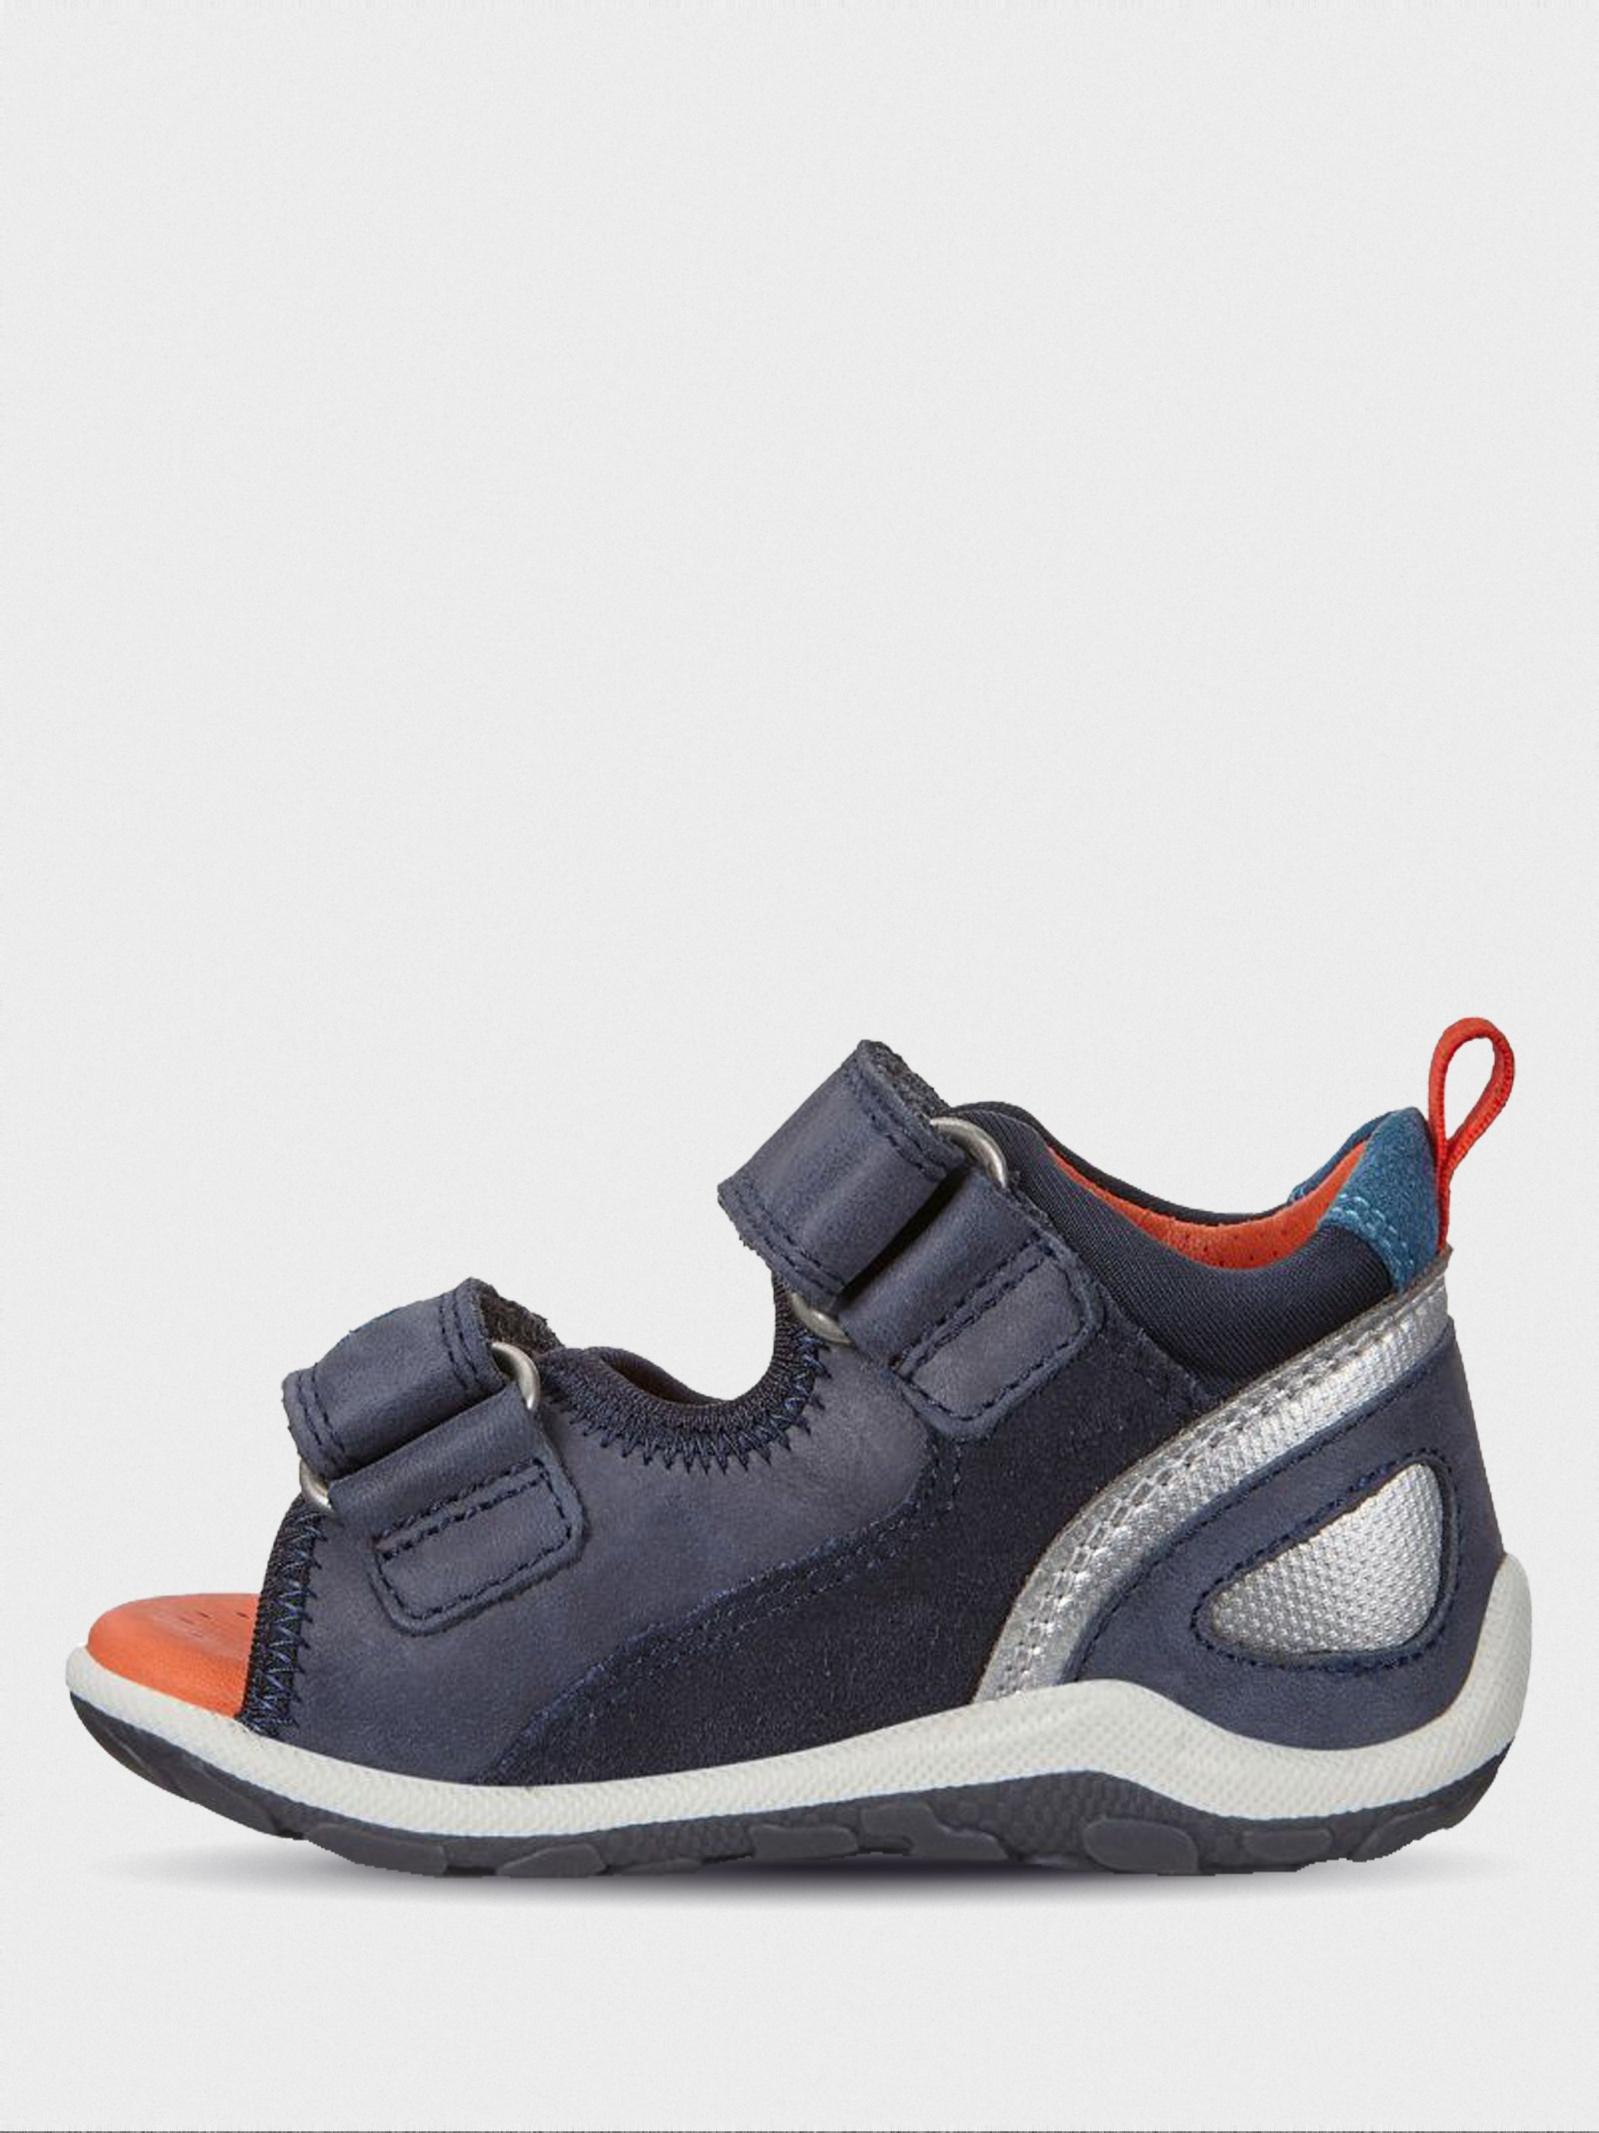 Сандалии для детей ECCO BIOM MINI SANDAL 754821(50769) модная обувь, 2017